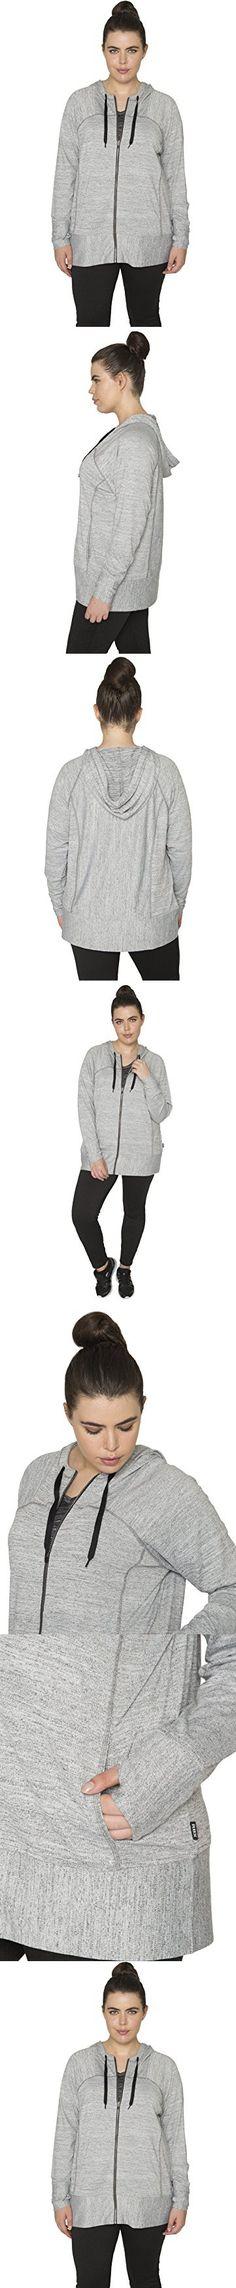 RBX Active Plus Size Women's Lightweight Sweater Zip Hoodie Jacket with Contrast Trim